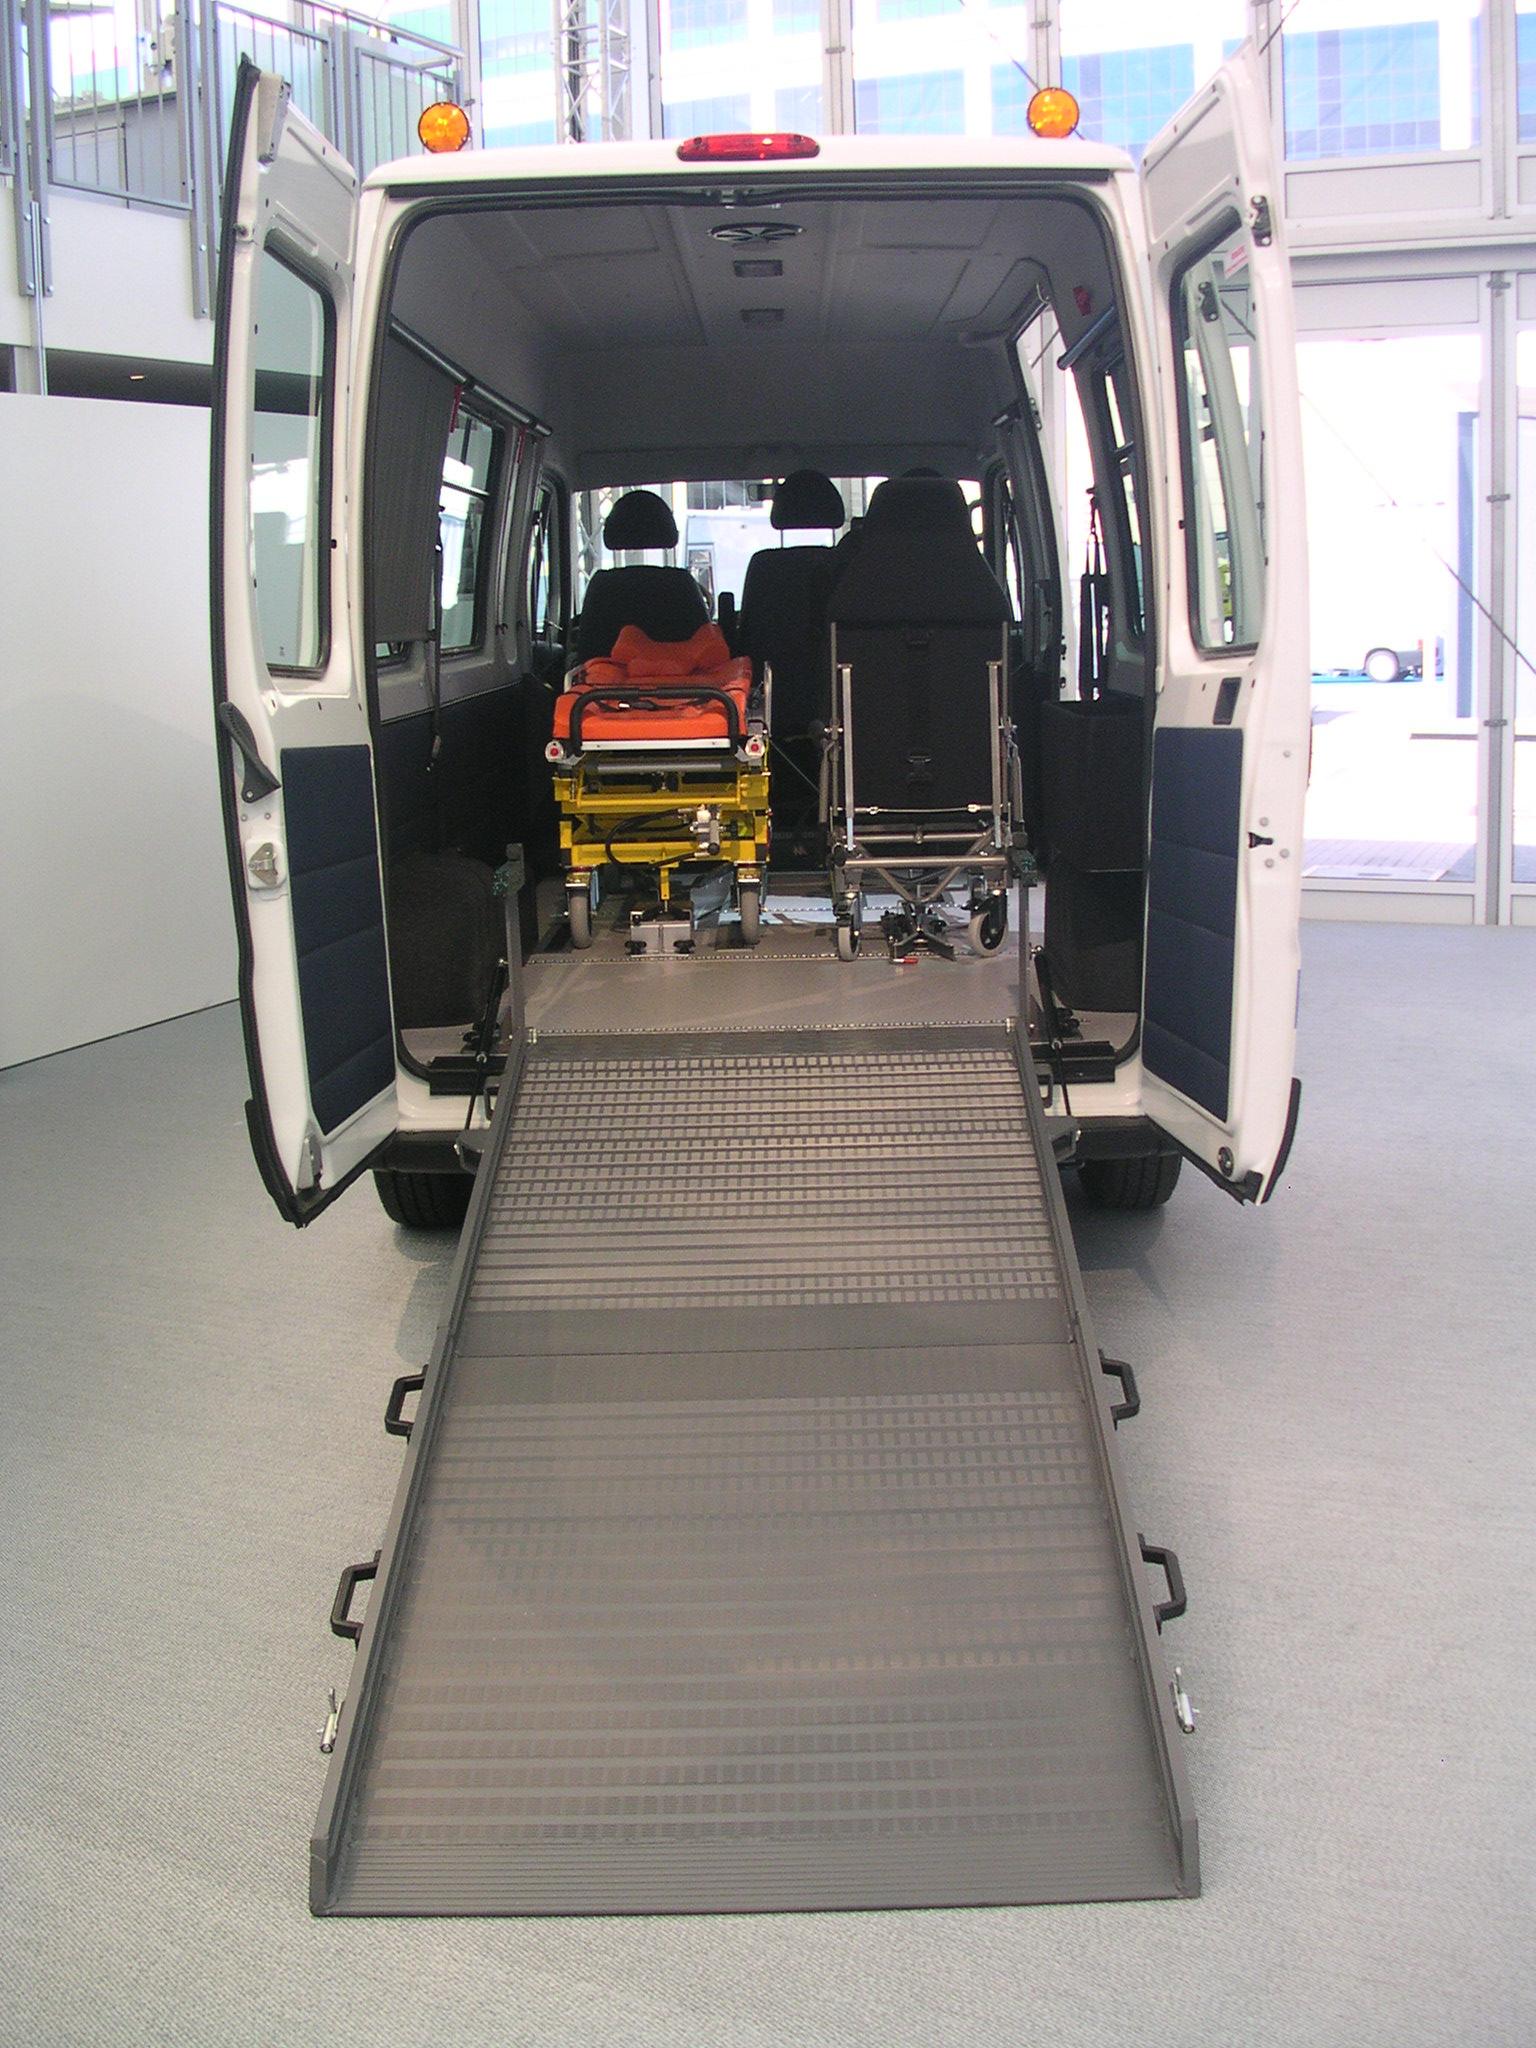 Behindertentransporter mit Rollstuhlrampe.jpg